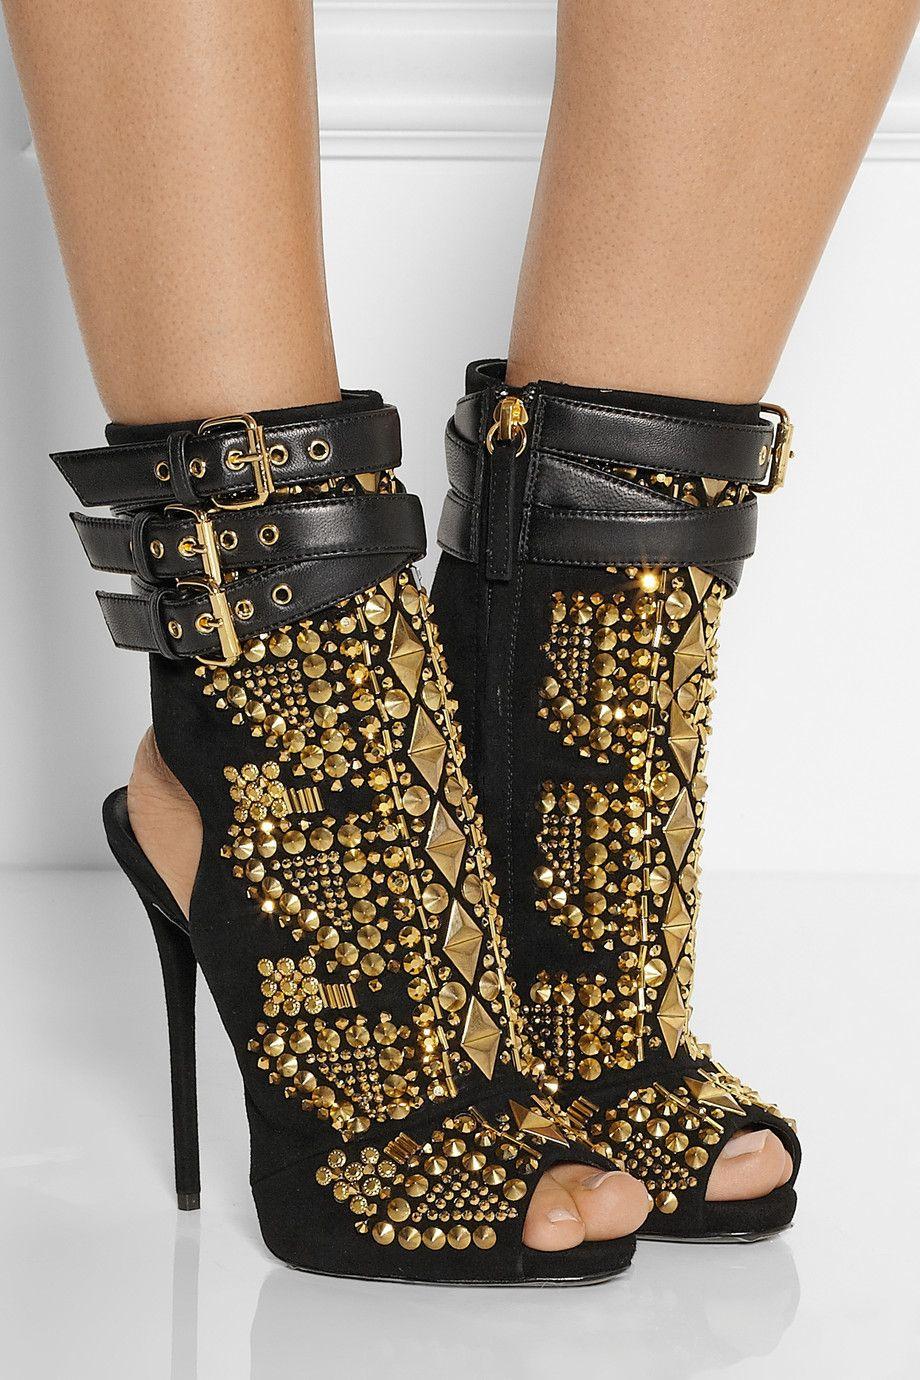 Zanotti Heels